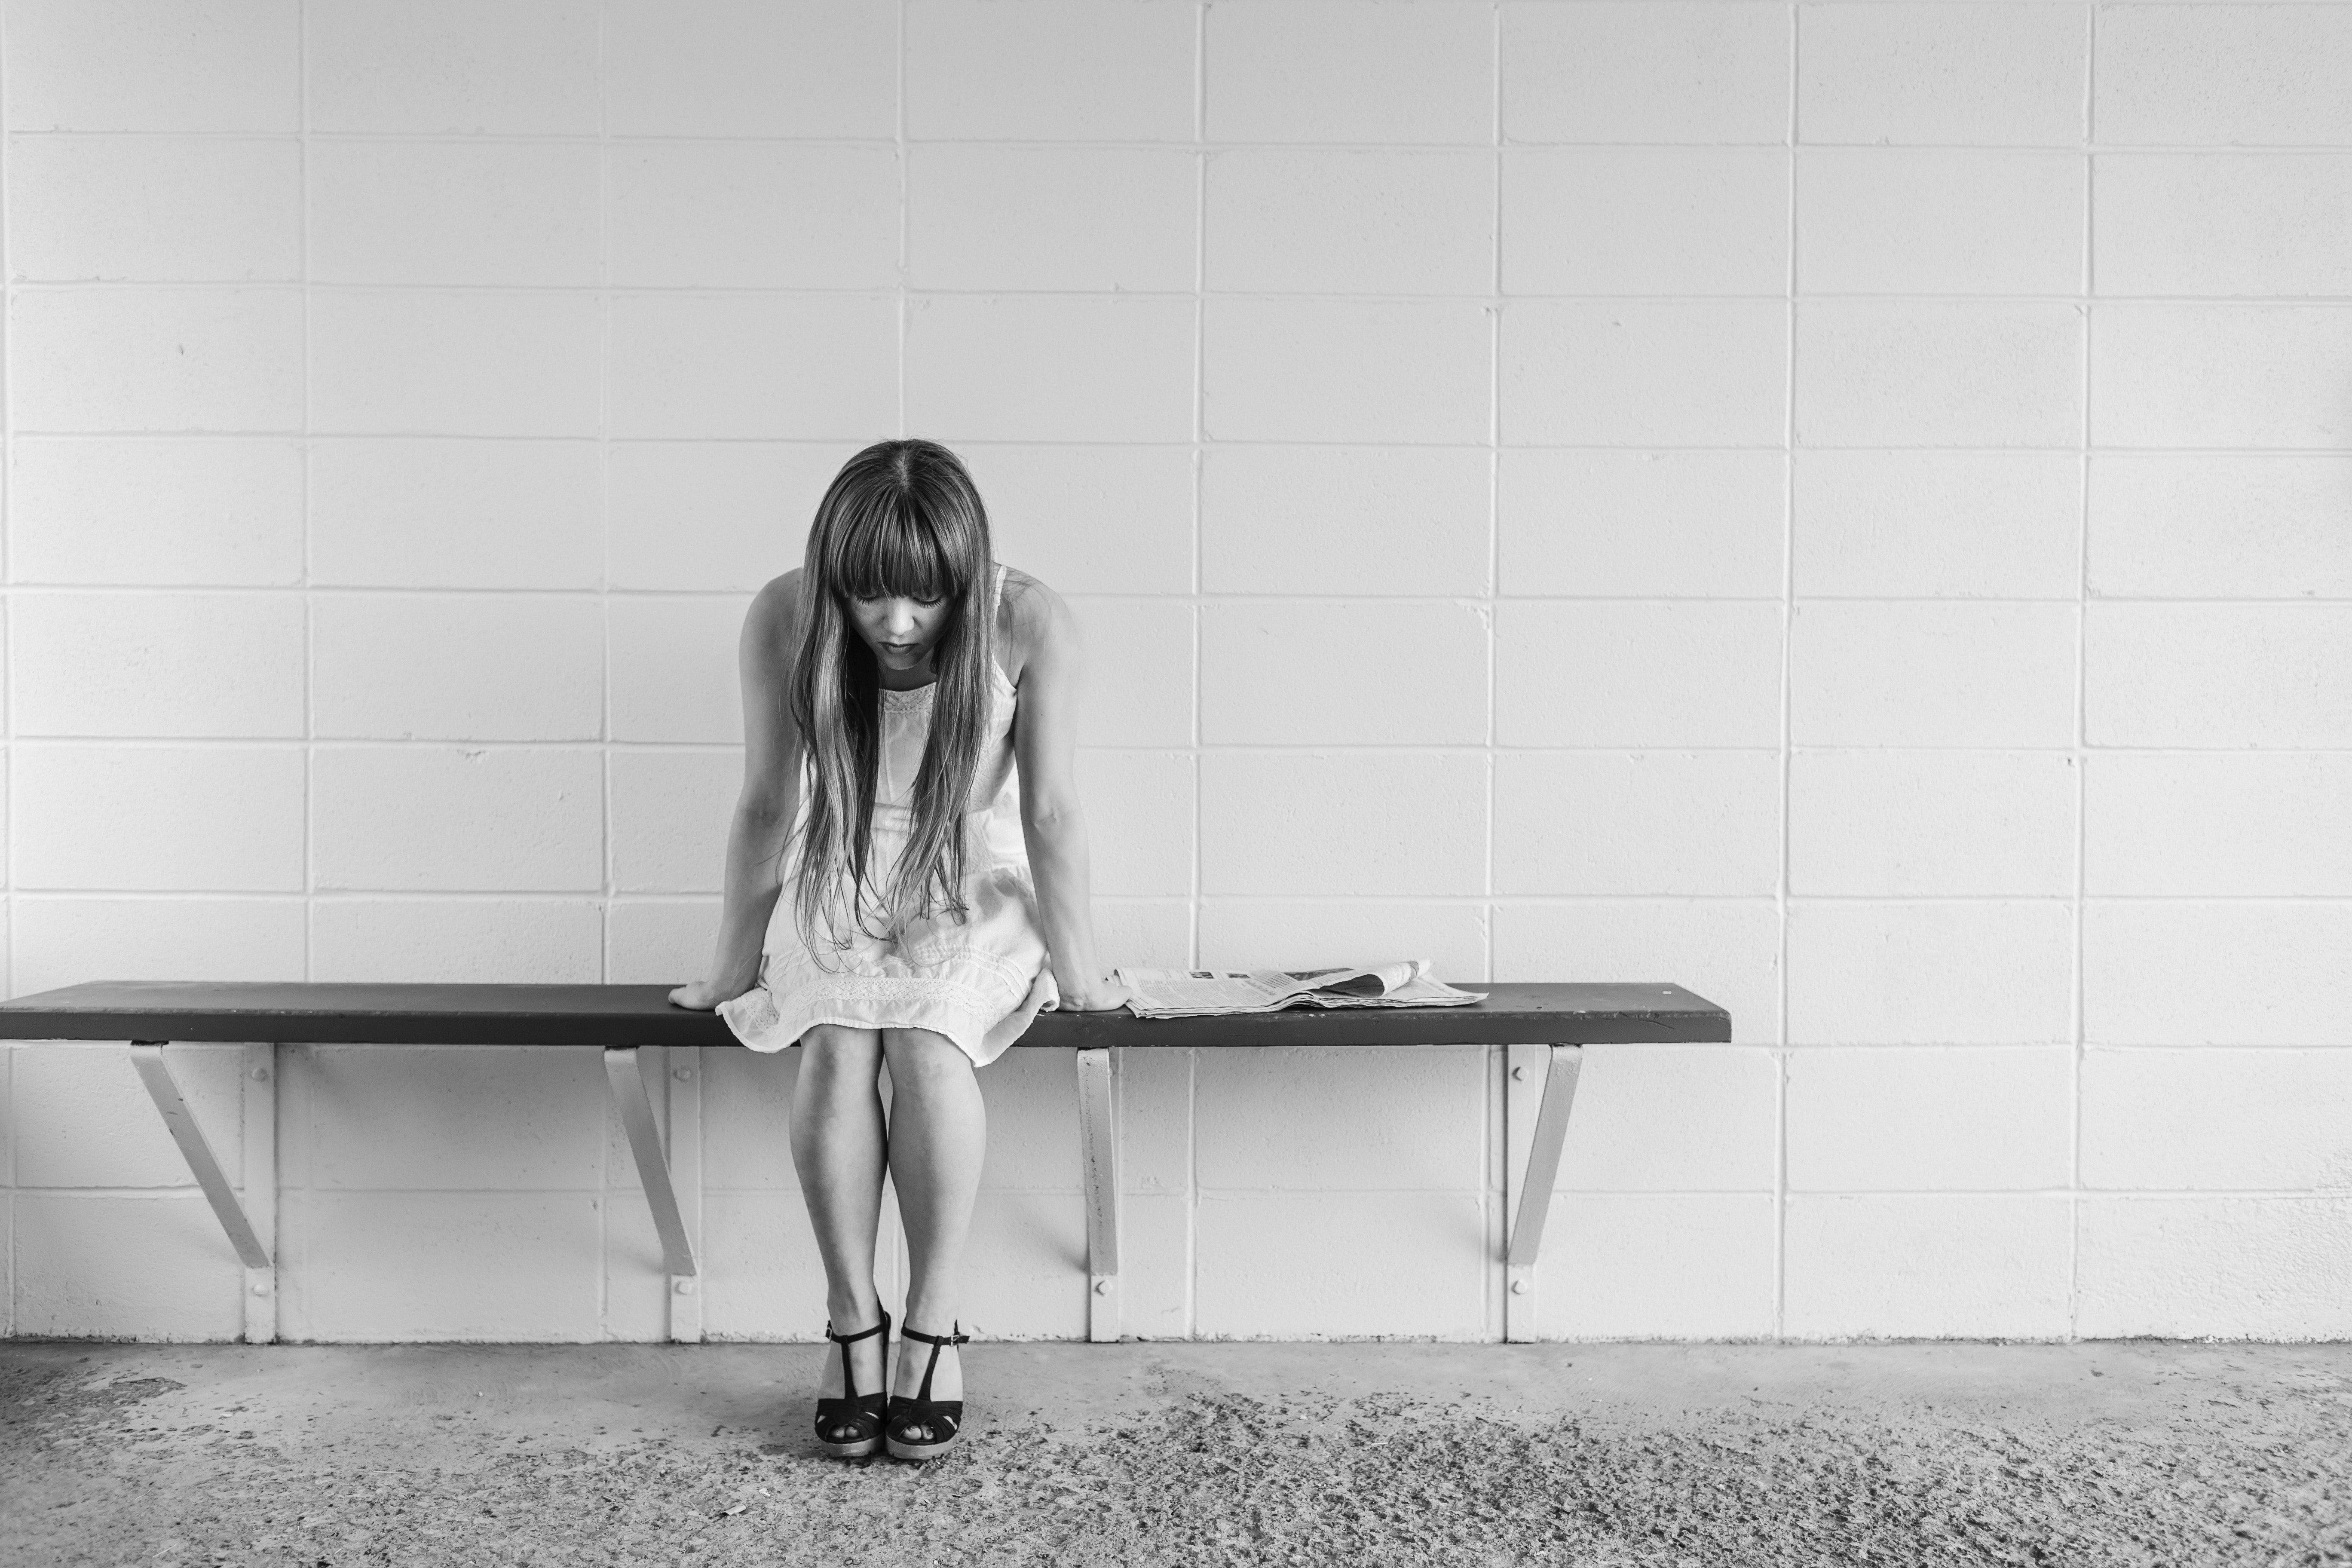 Black and white depressed depression 2369 montgomery community media